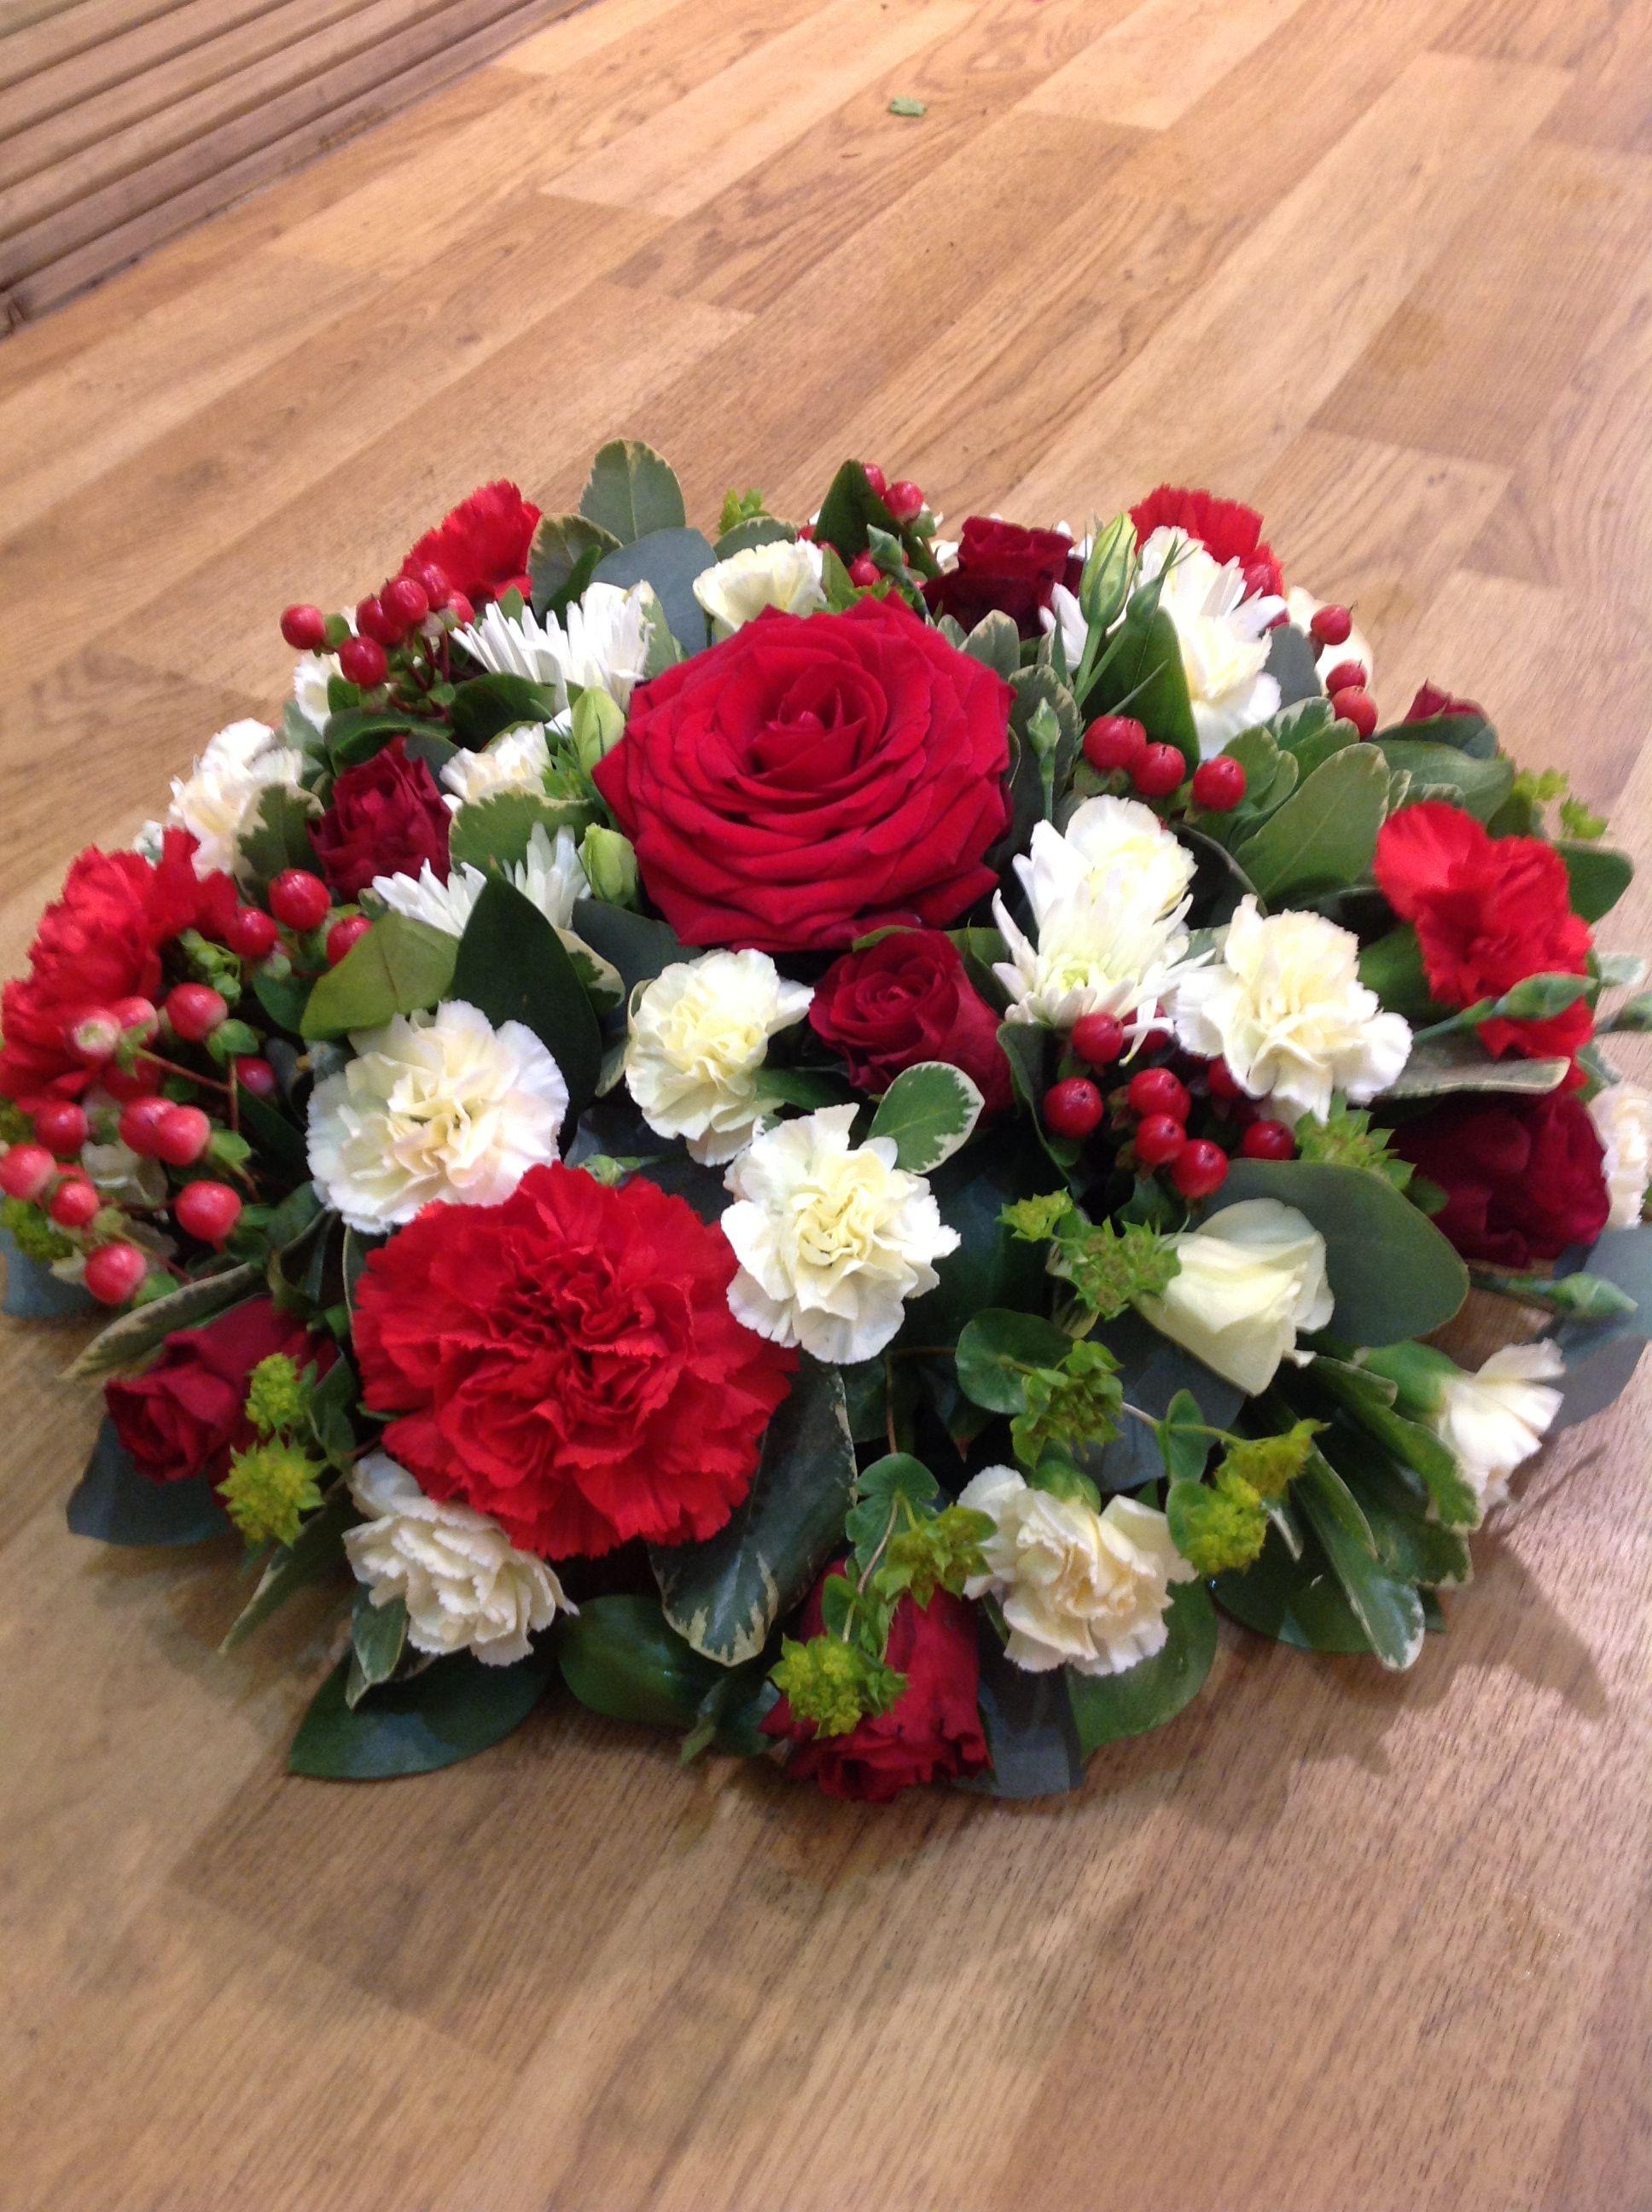 Mixed Red Rose Posie Pad Funeral Arrangementsflower